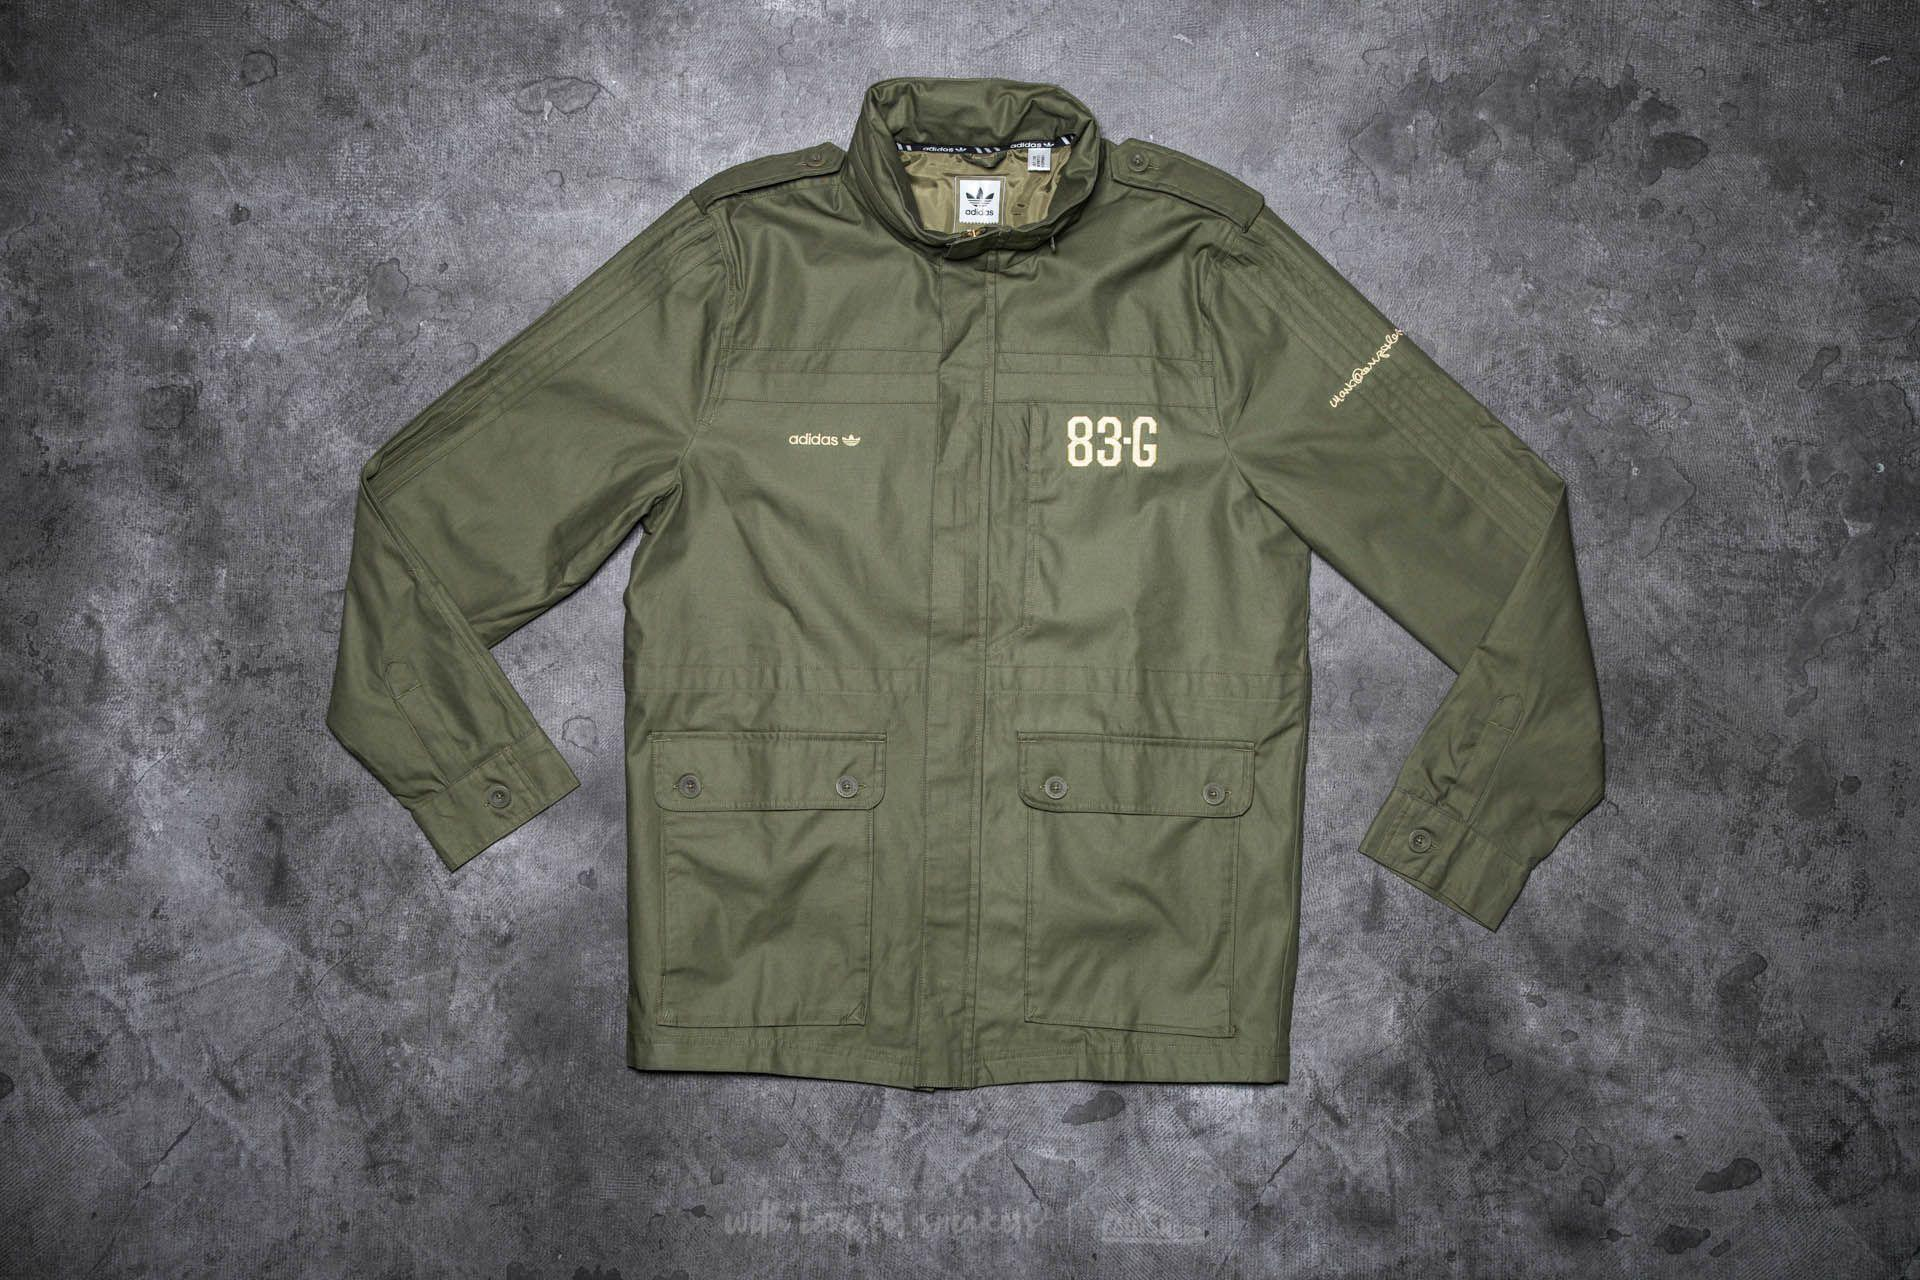 2bd0fec13f10 Lyst - adidas Originals Adidas Field Jacket Olive Cargo in Green for Men